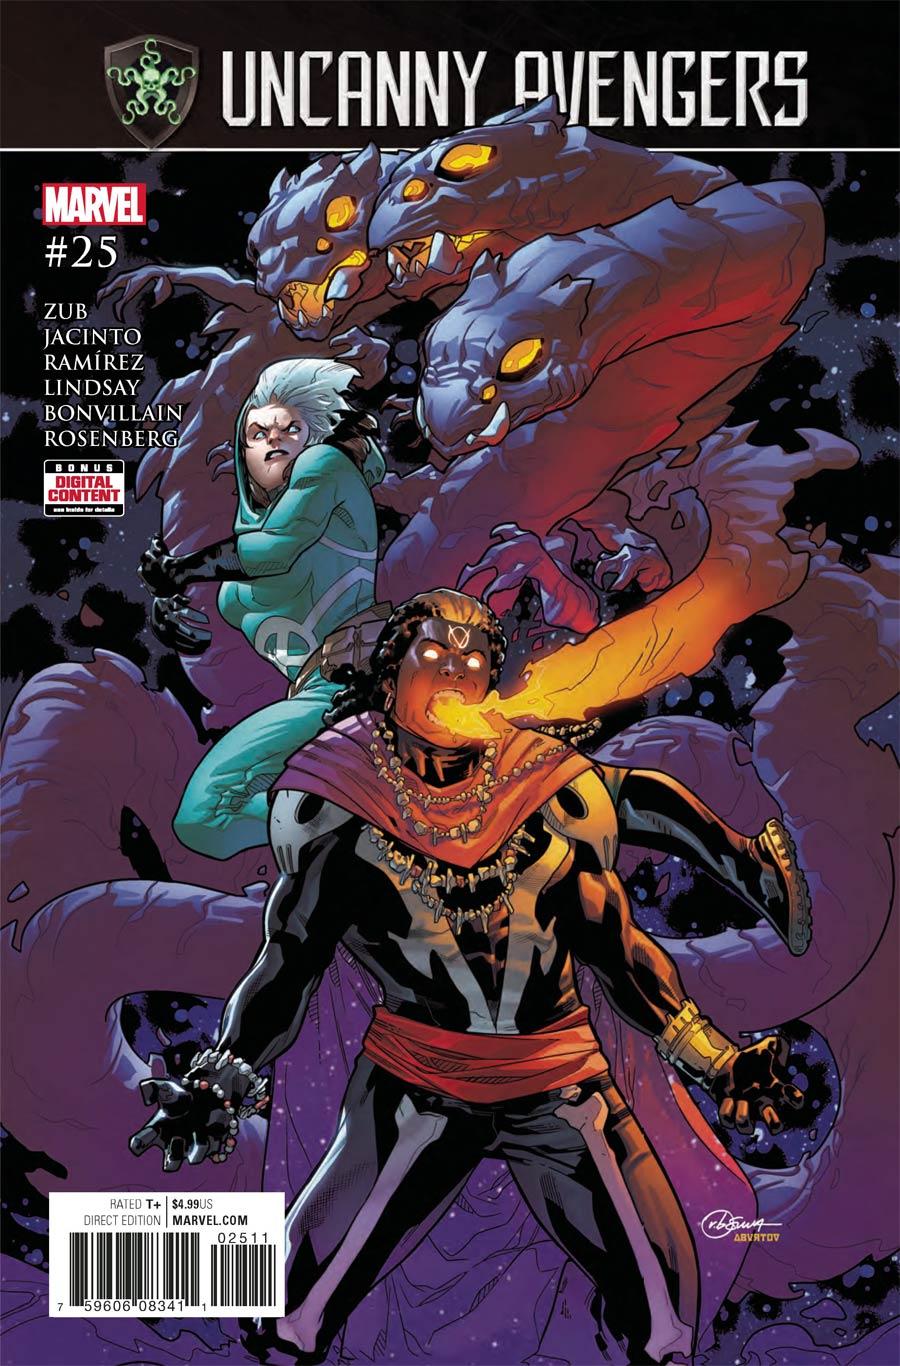 Uncanny Avengers Vol 3 #25 Cover A Regular RB Silva Cover (Secret Empire Tie-In)